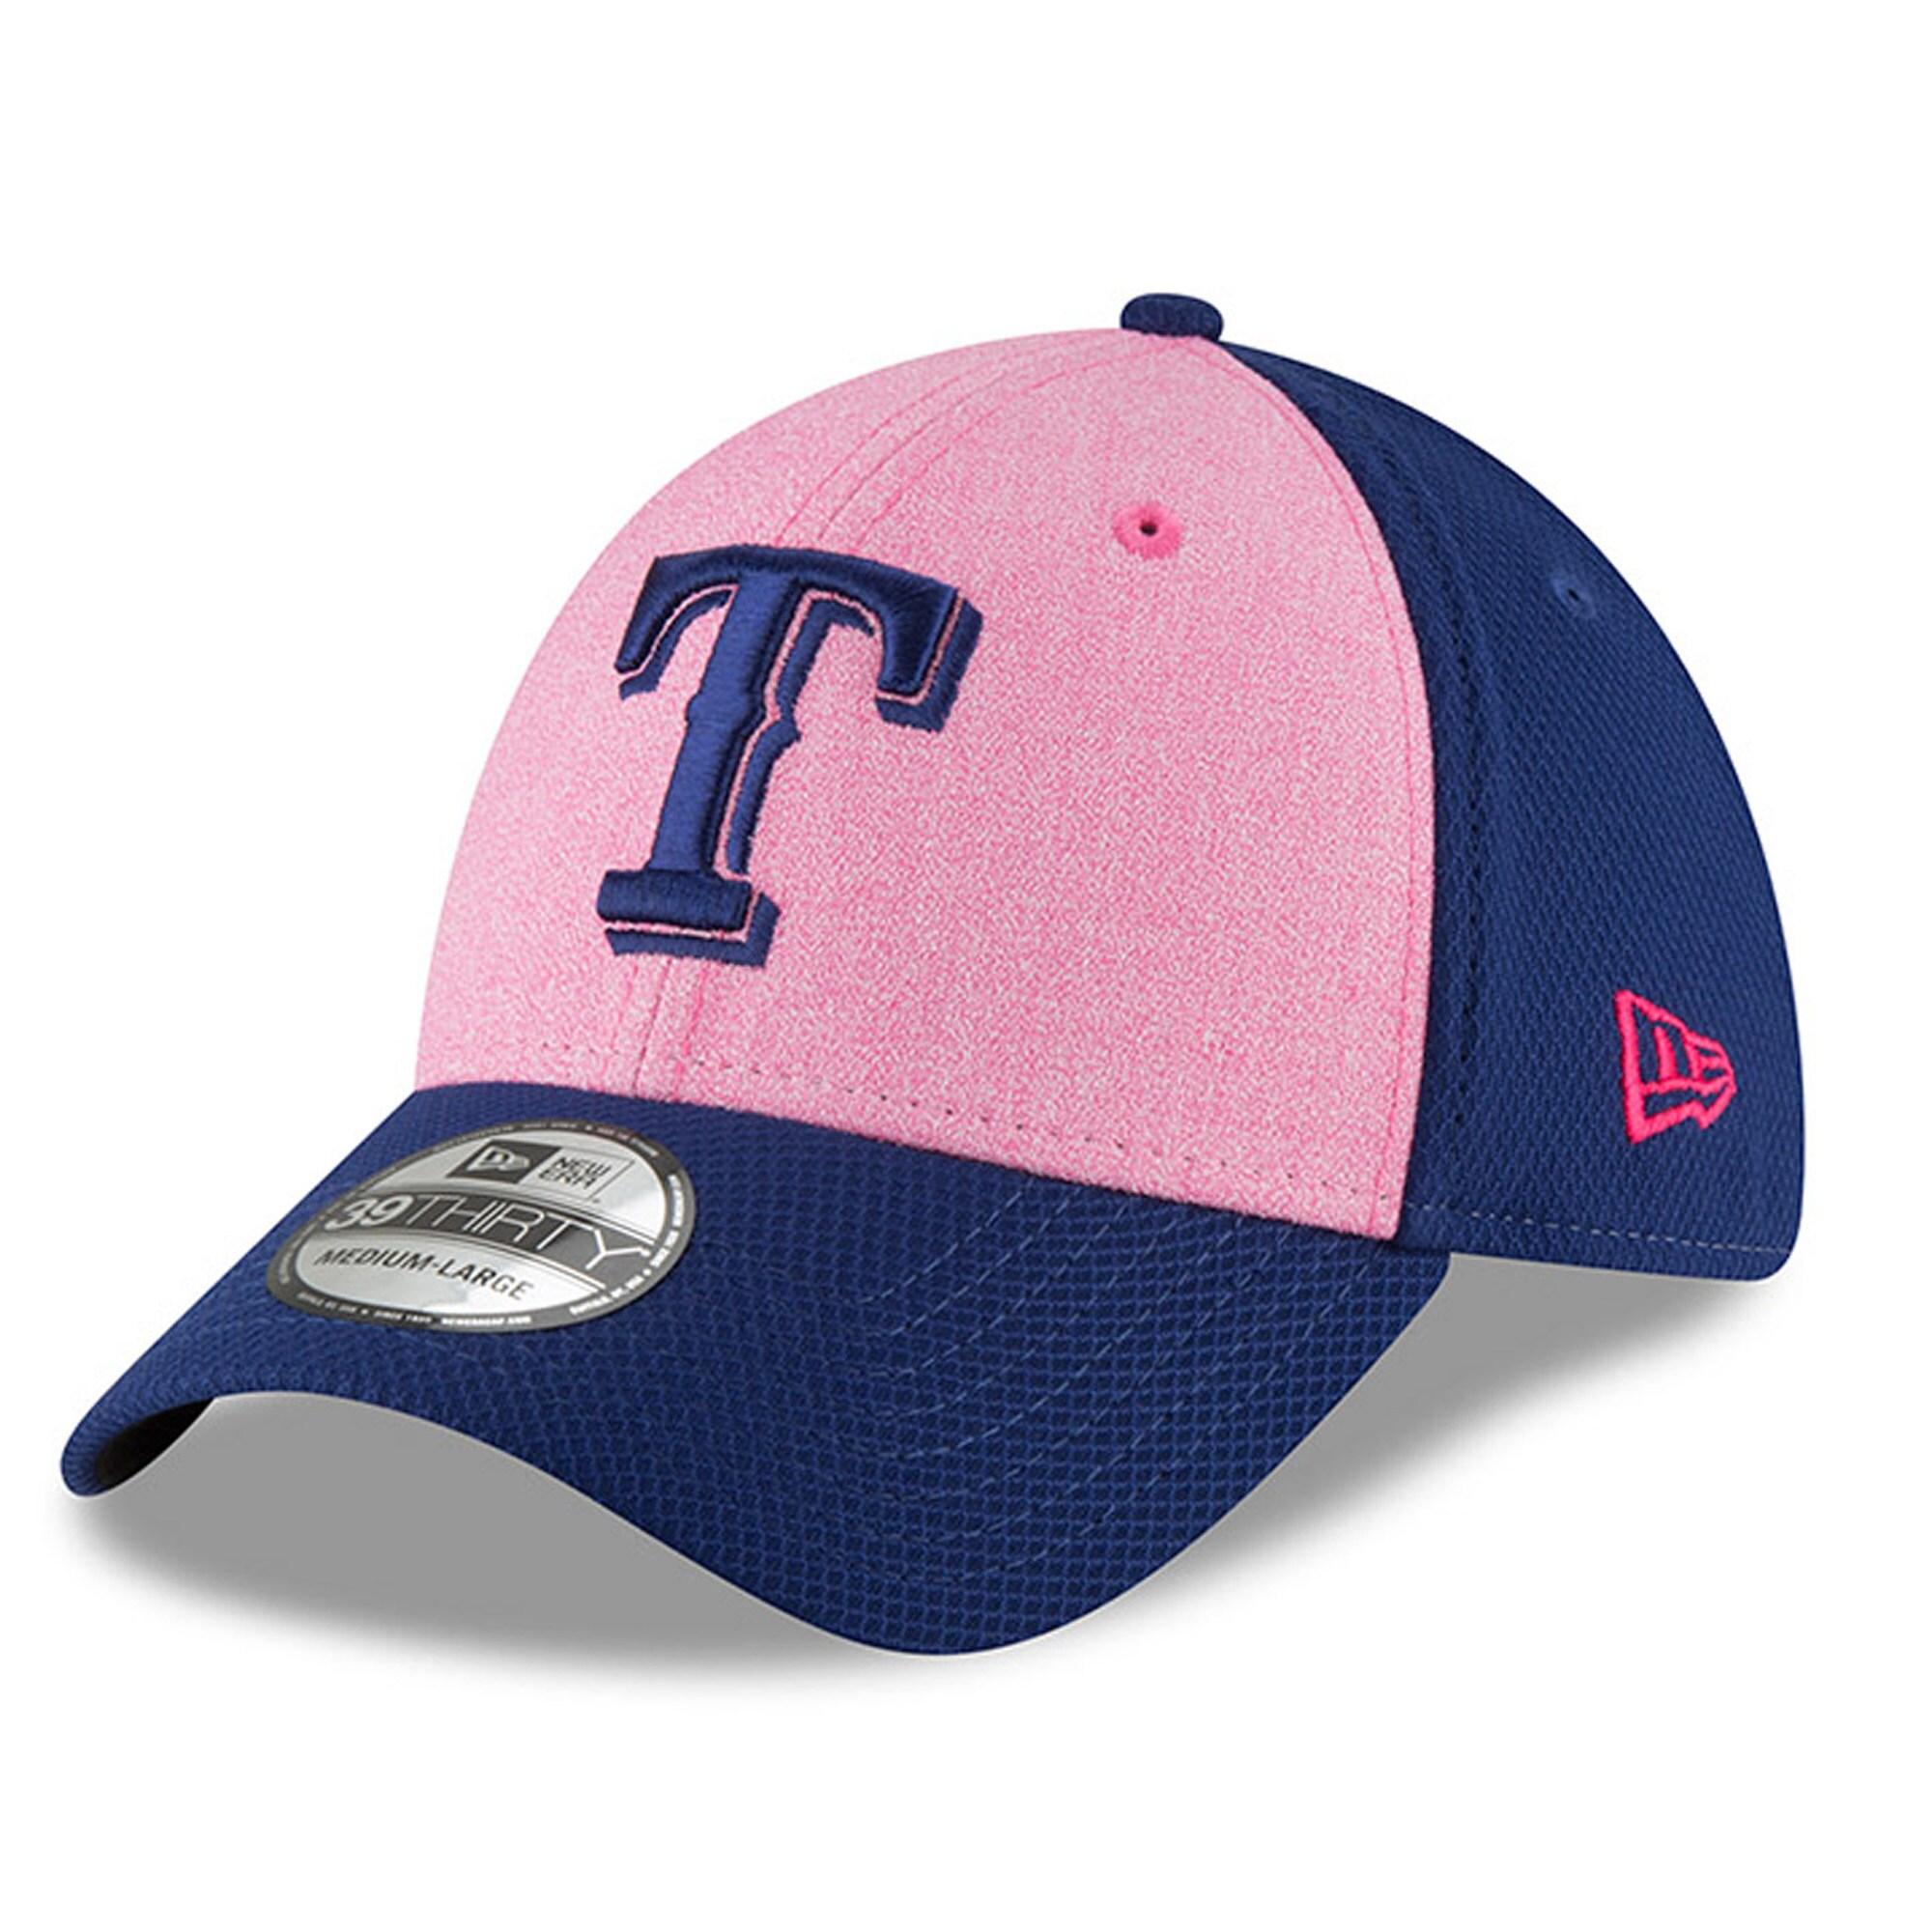 Texas Rangers New Era 2018 Mother's Day 39THIRTY Flex Hat - Pink